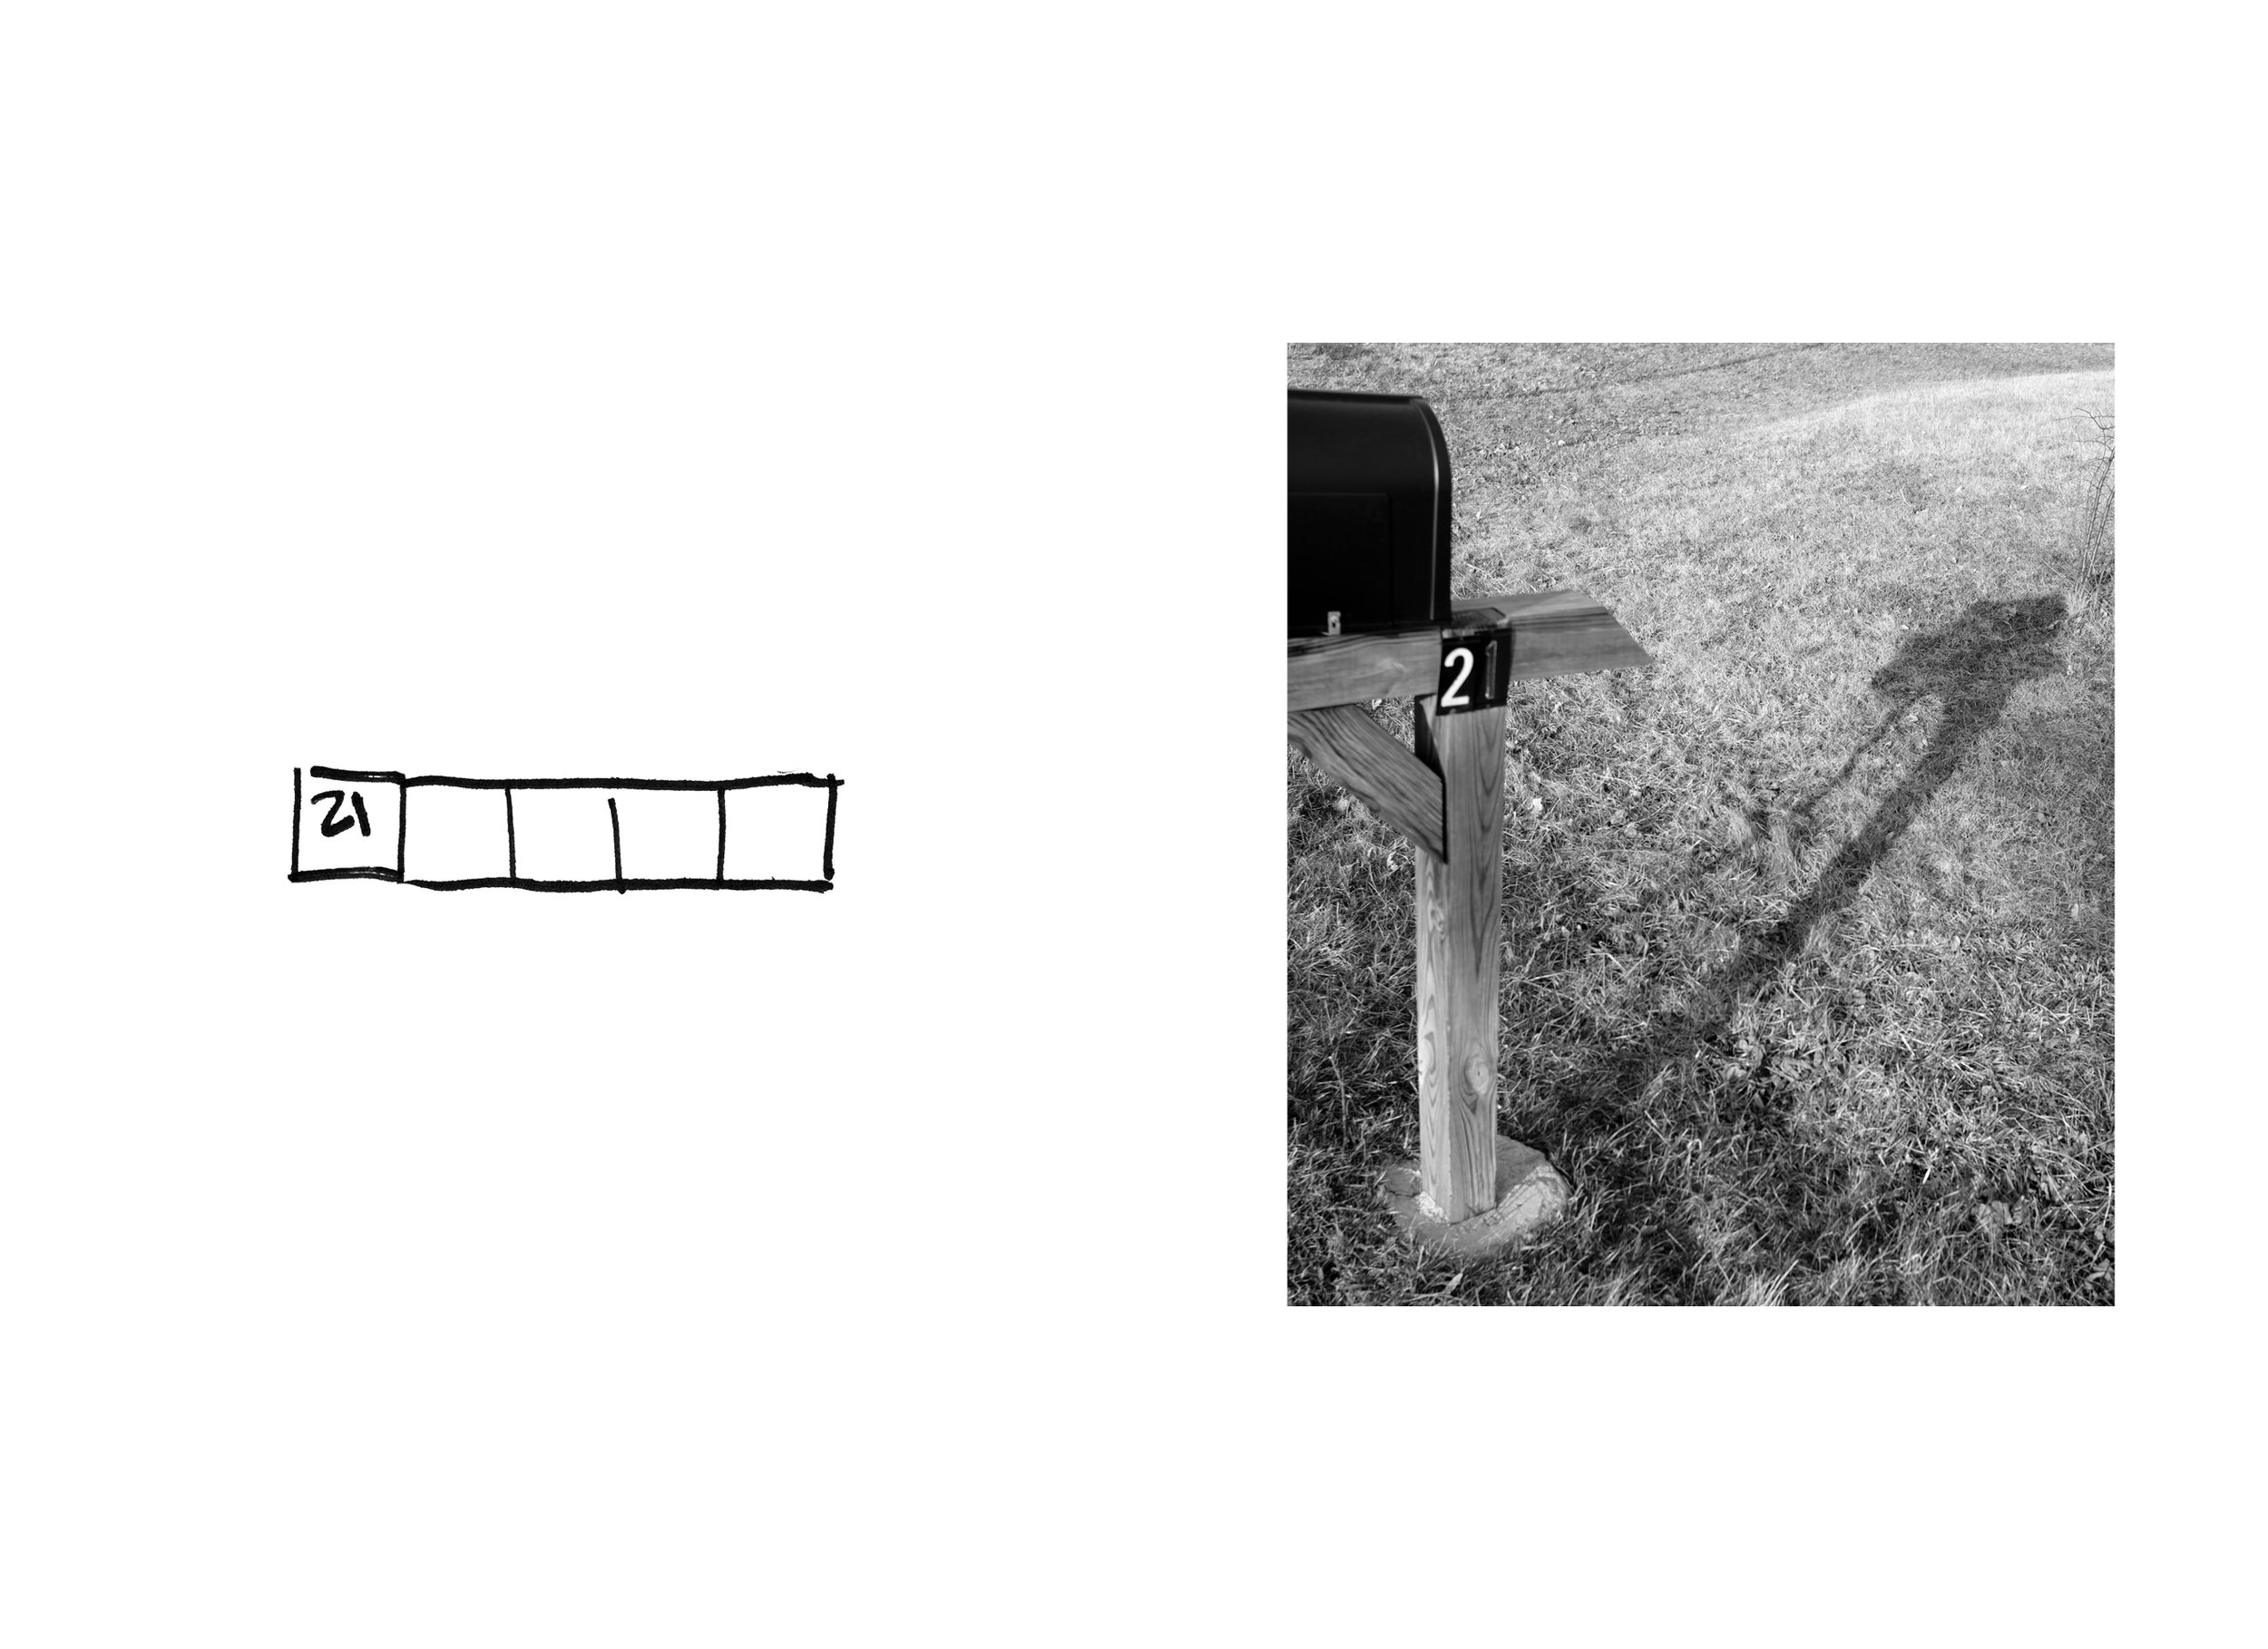 maloney_puzzles_websitie16.jpg